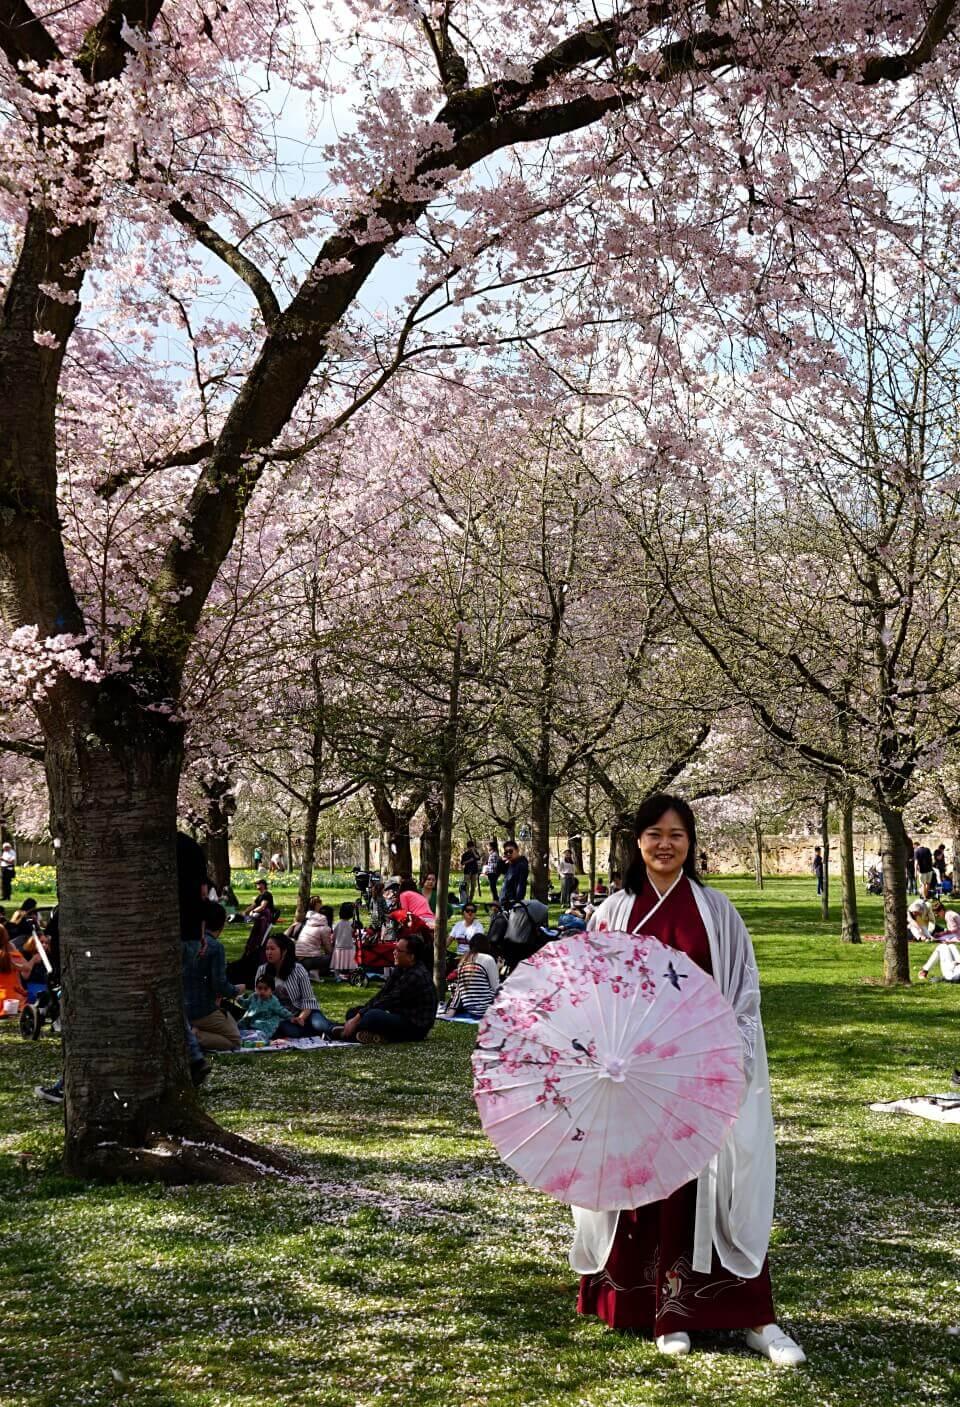 Eine kunterbunte Mischung an Kulturen bei der Kirschbluete im Schlossgarten Schwetzingen